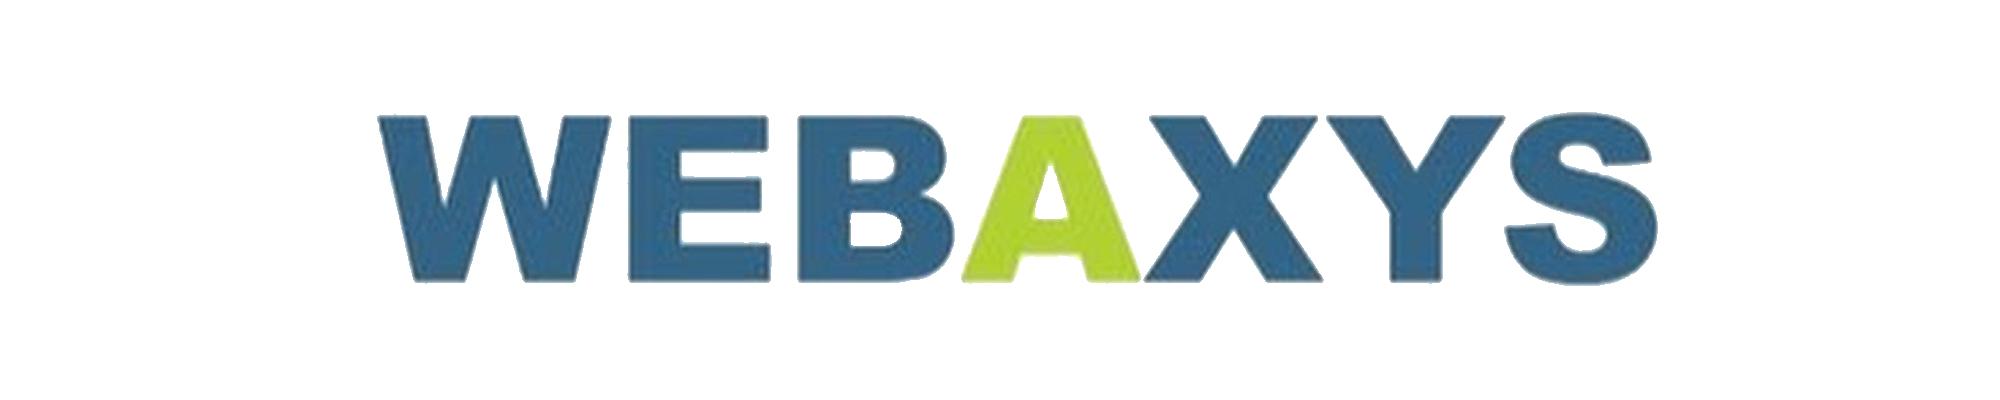 logo de Webaxys